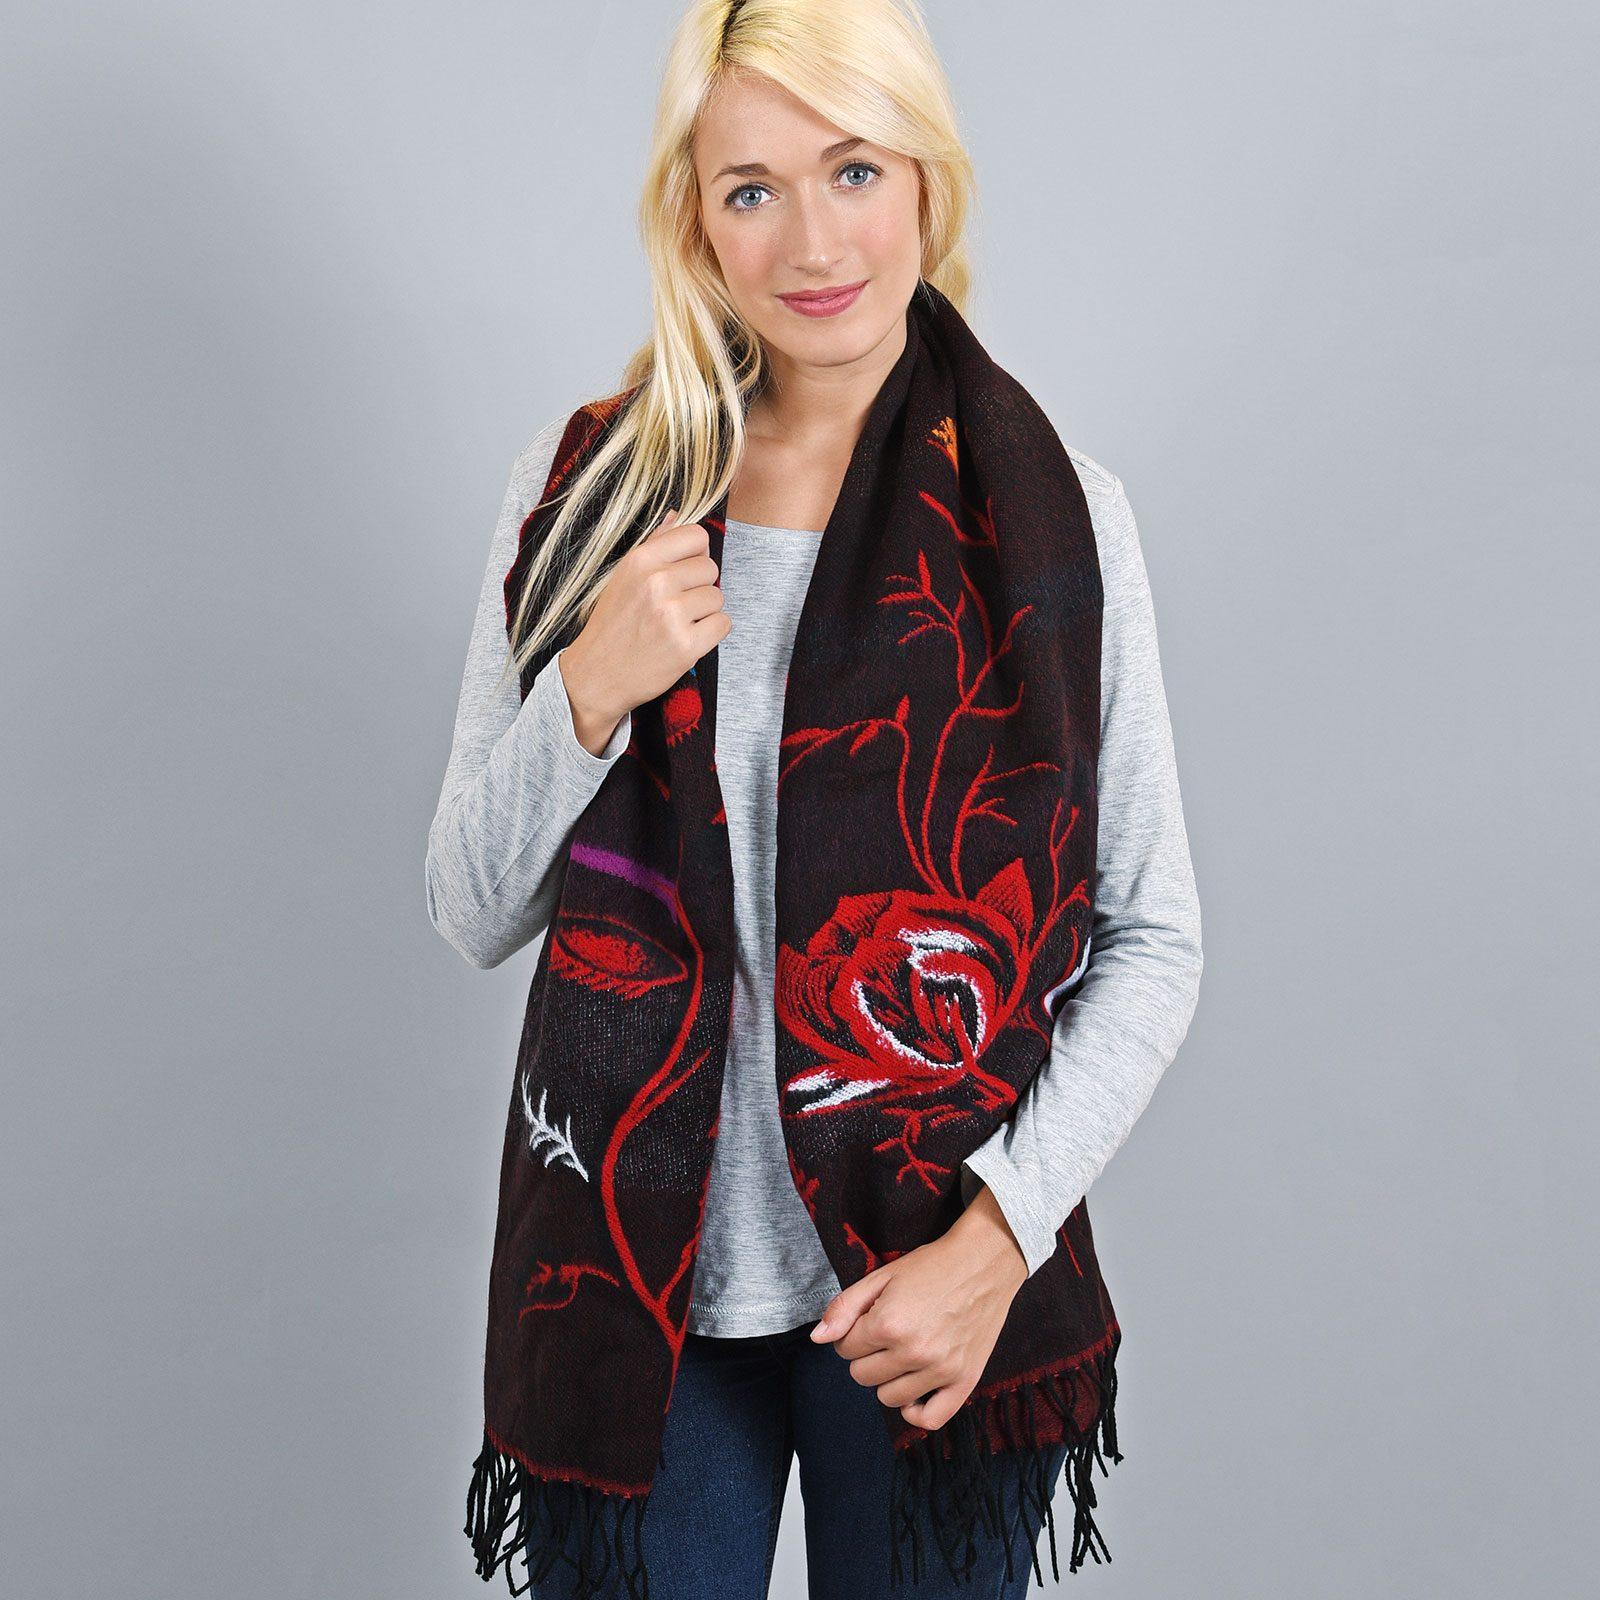 http://lookbook.allee-du-foulard.fr/wp-content/uploads/2019/01/AT-03441-VF16-2-chale-femme-rouge-et-noir-cerisiers-1600x1600.jpg